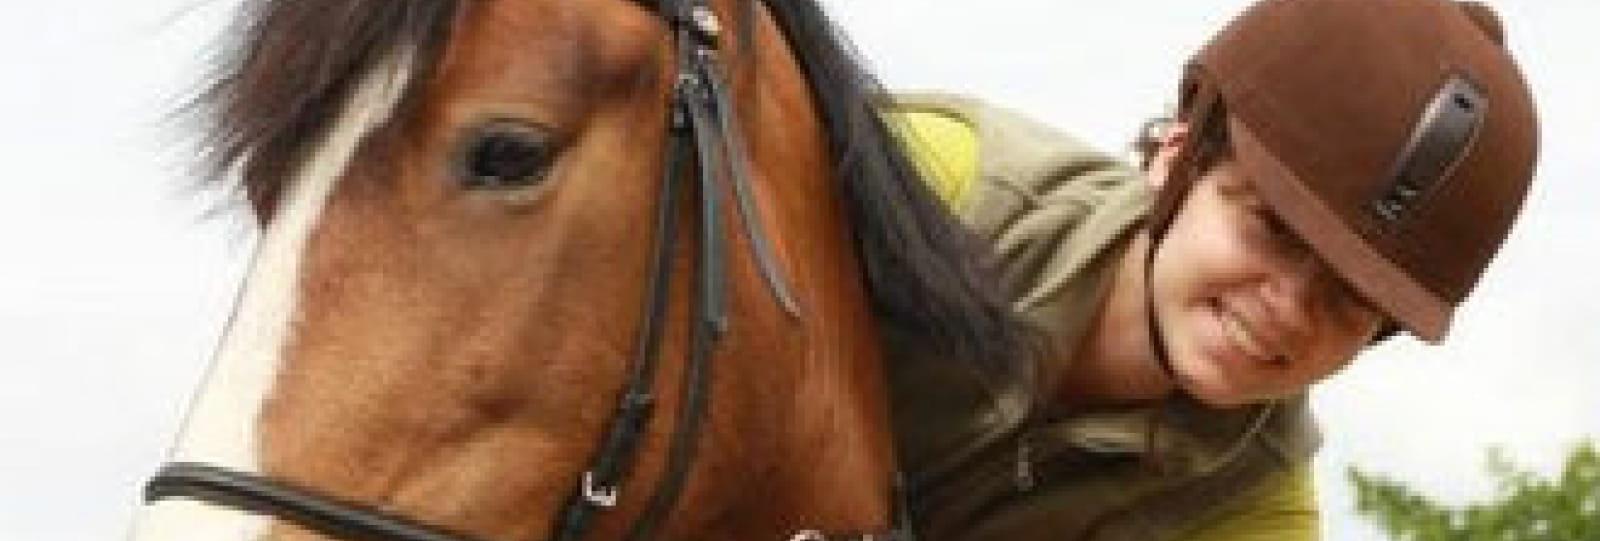 Equitation adaptée avec Poney aventure